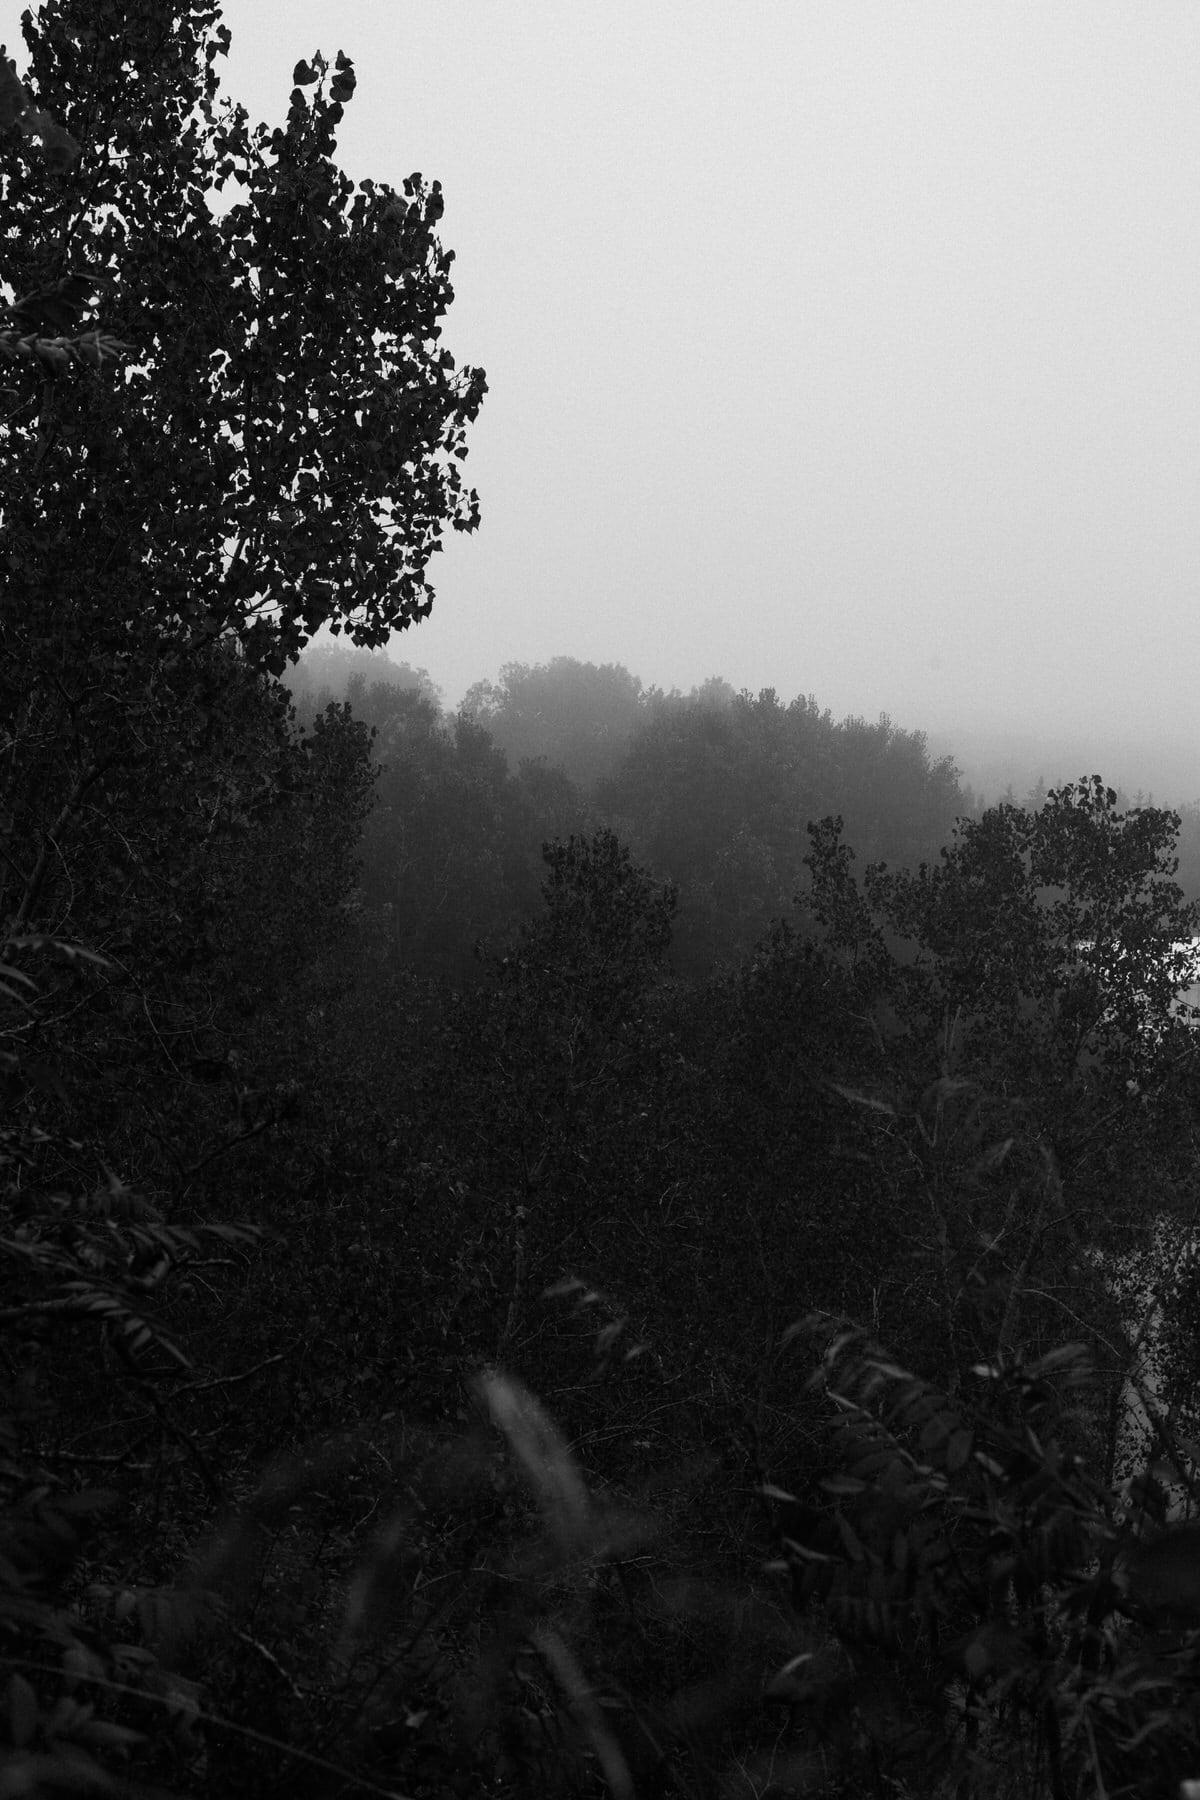 Kiekhaefer-Park-Fond-du-Lac-Wisconsin-black-and-white-fine-art-photography-by-Studio-L-photographer-Laura-Schneider-_3499